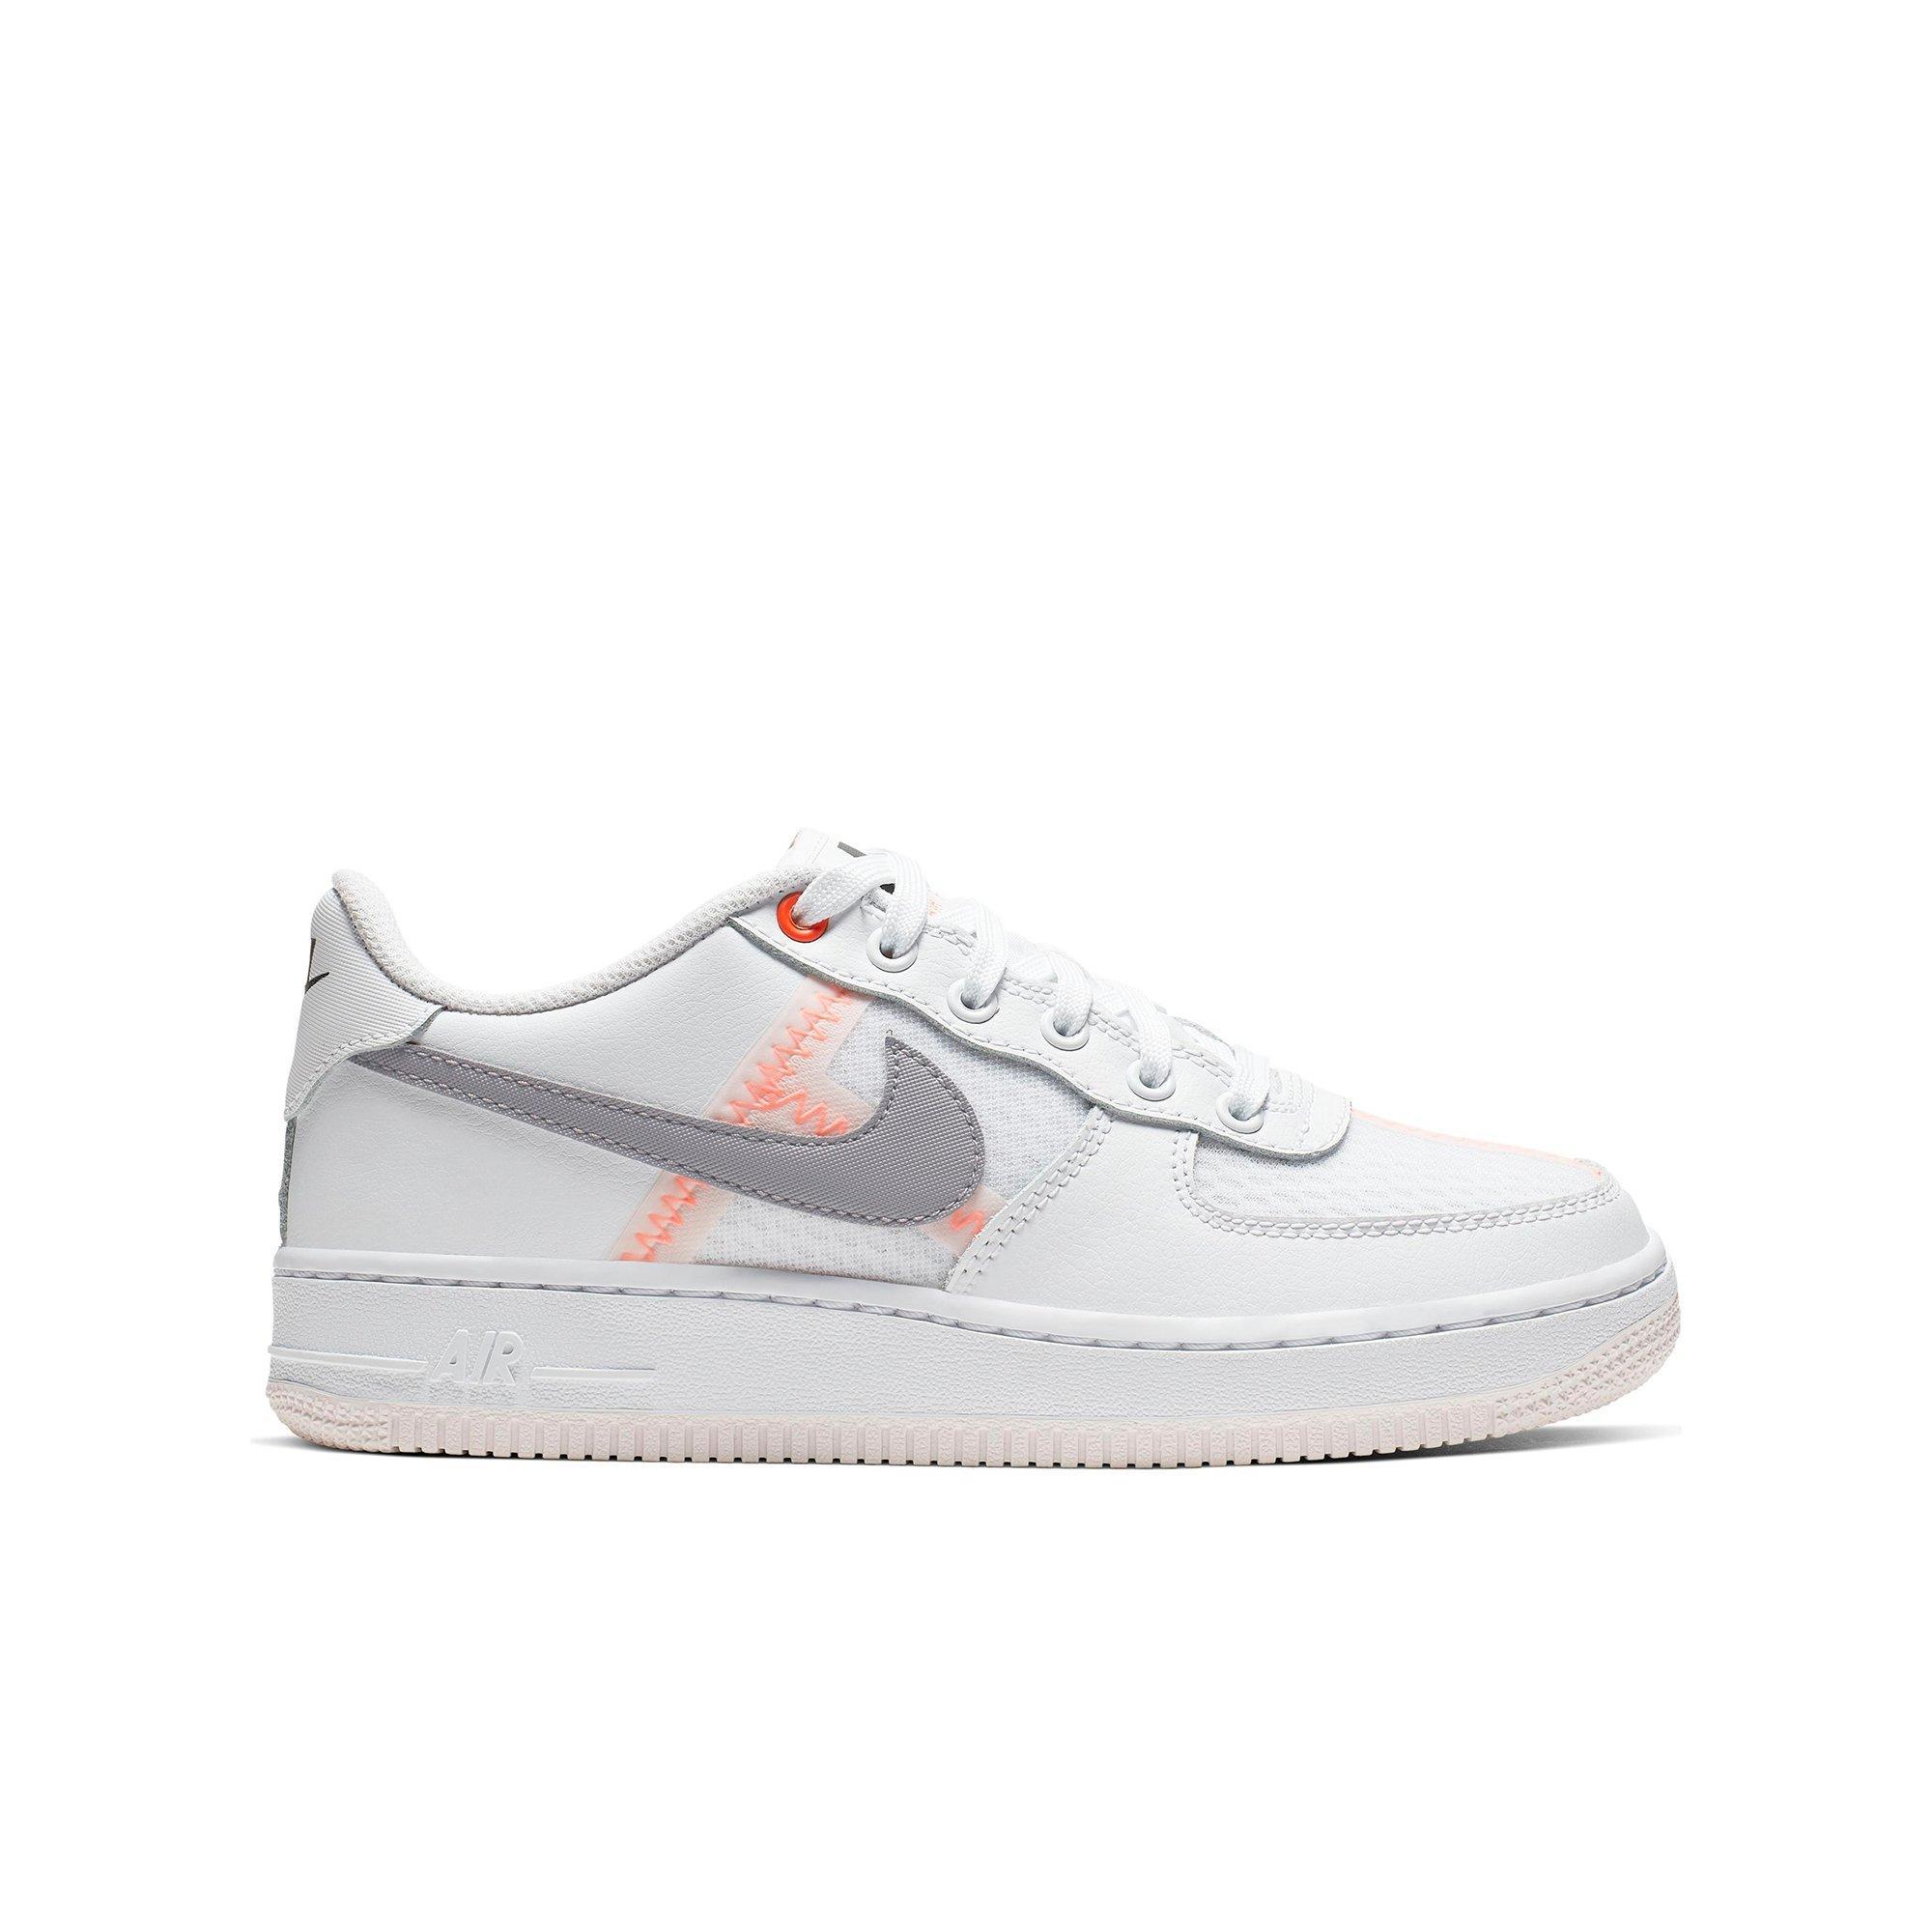 Dirigir Espectáculo Año  Nike Air Force 1